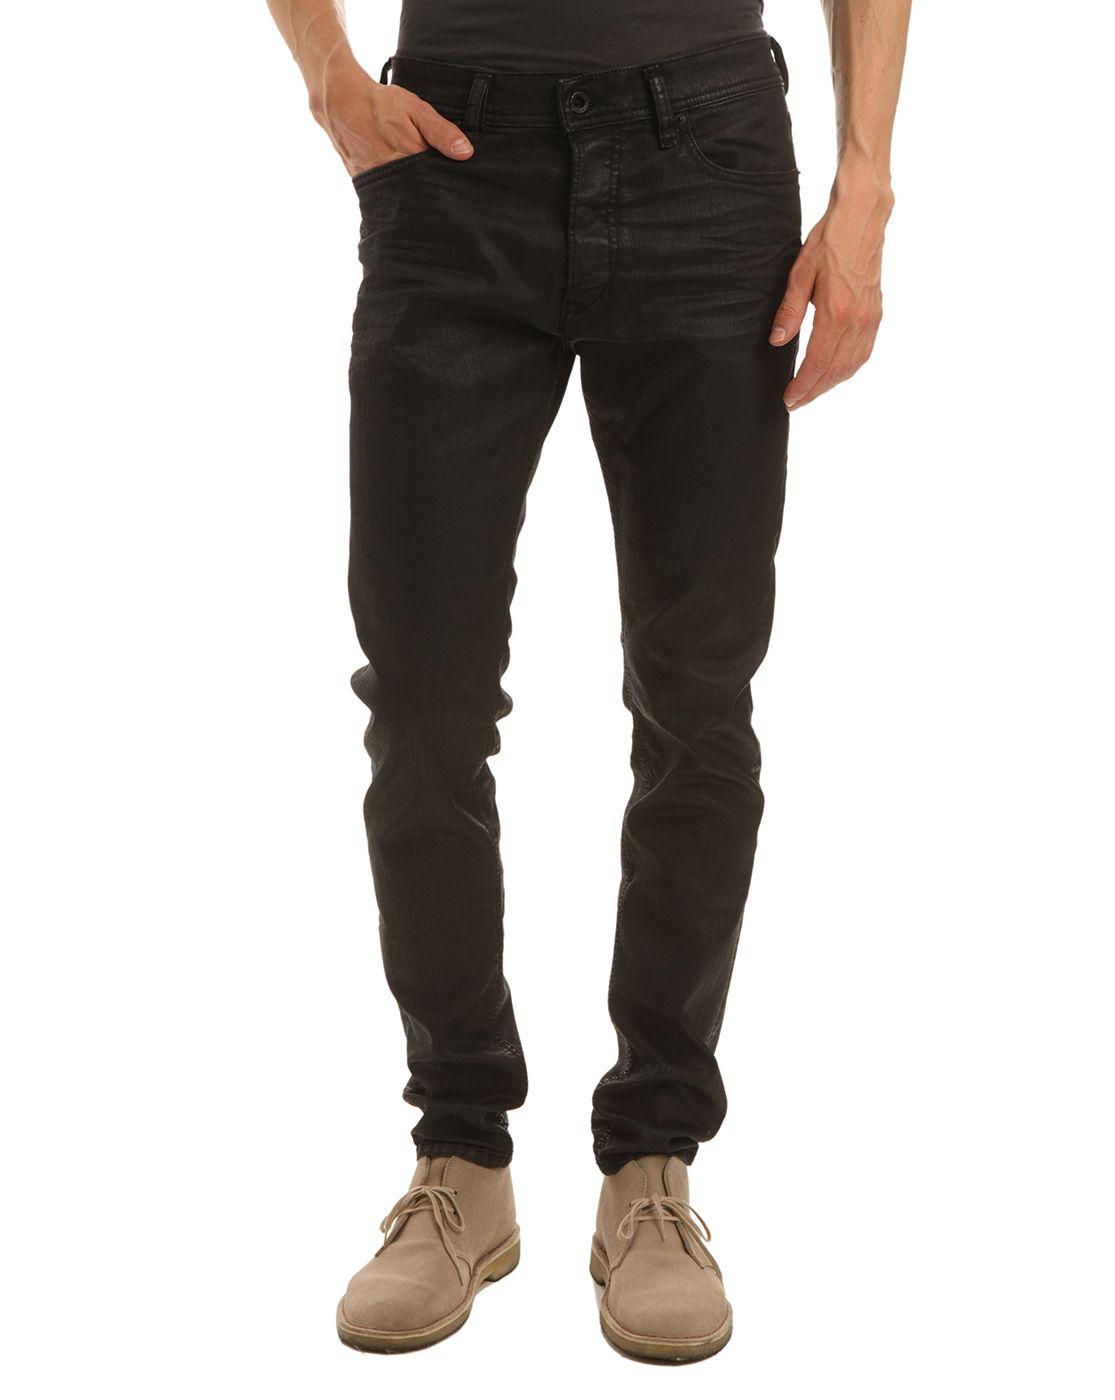 Diesel Tepphar Black Oiled Slim Fit Jeans in Black for Men  Lyst